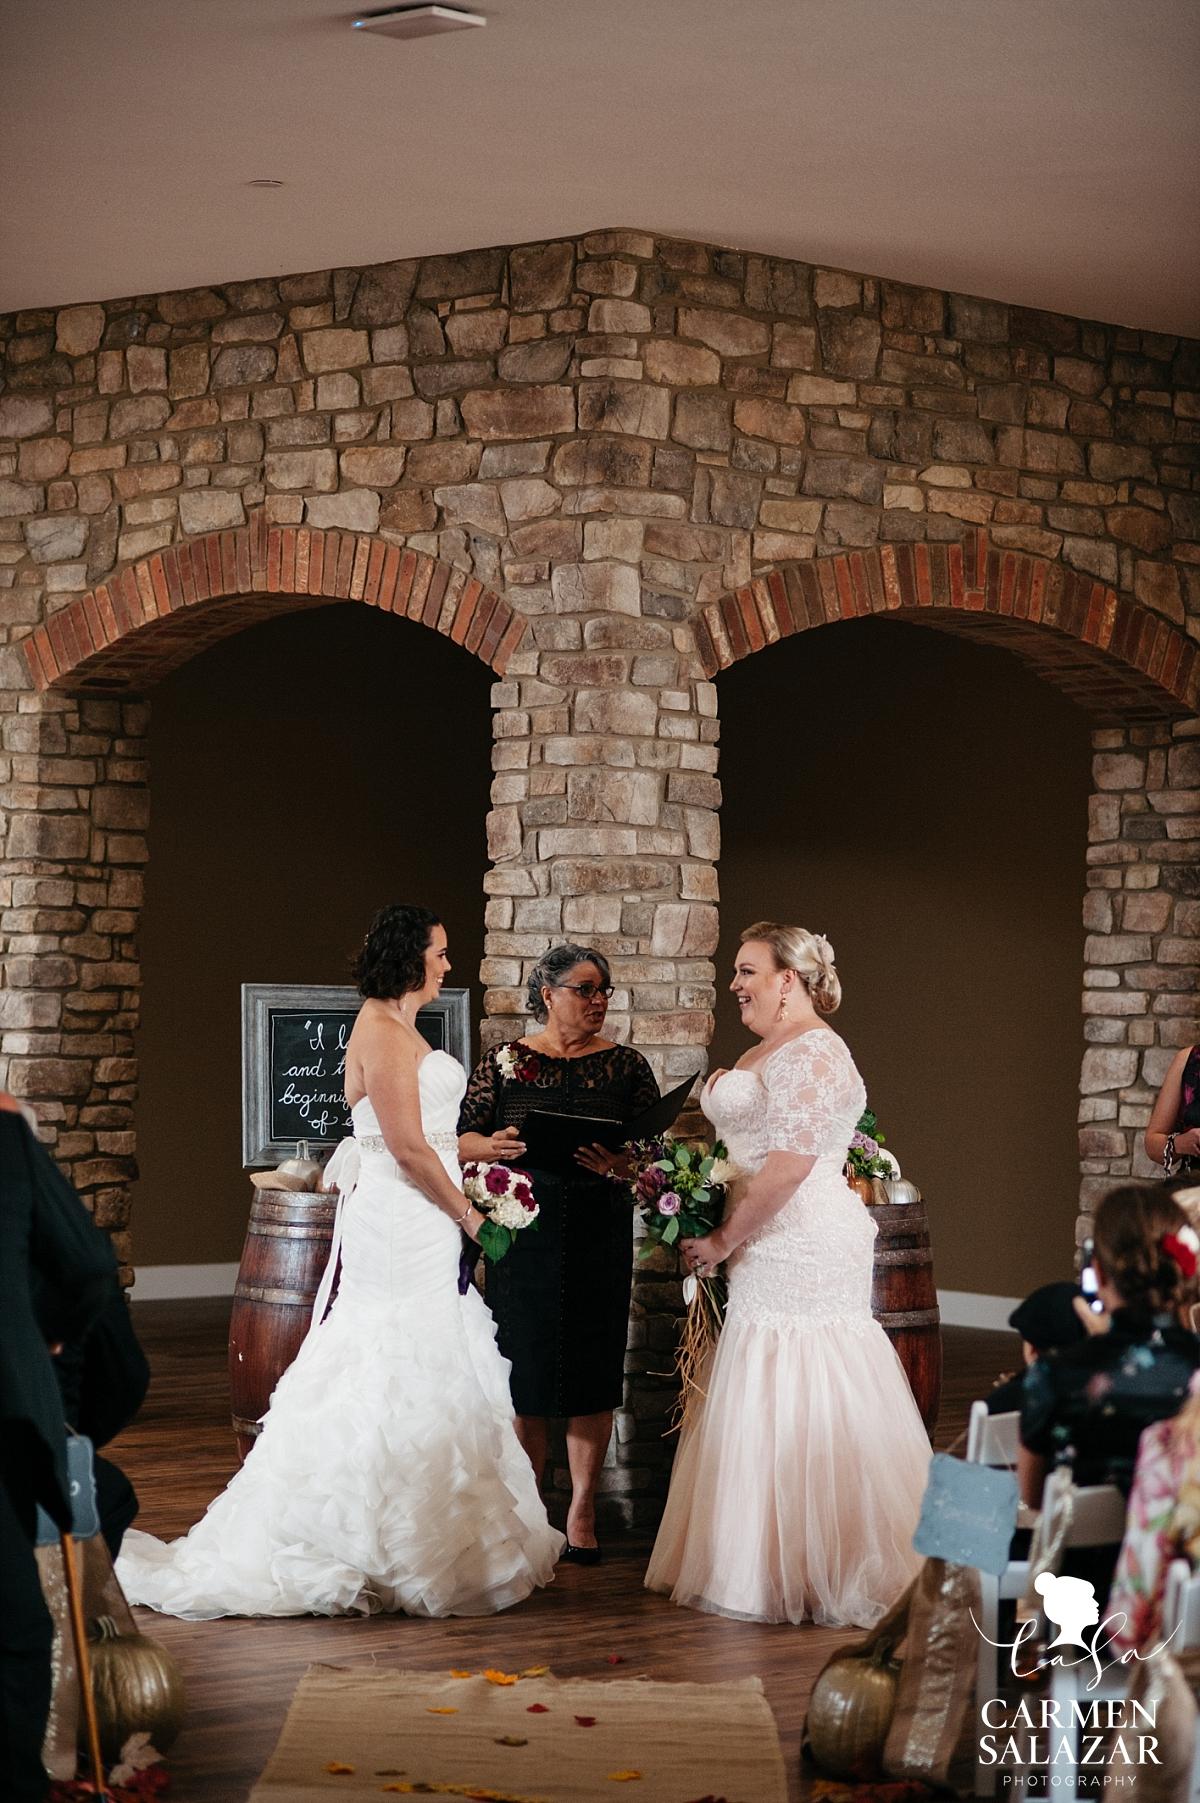 Lesbian wedding ceremony at Leer Vineyards - Carmen Salazar